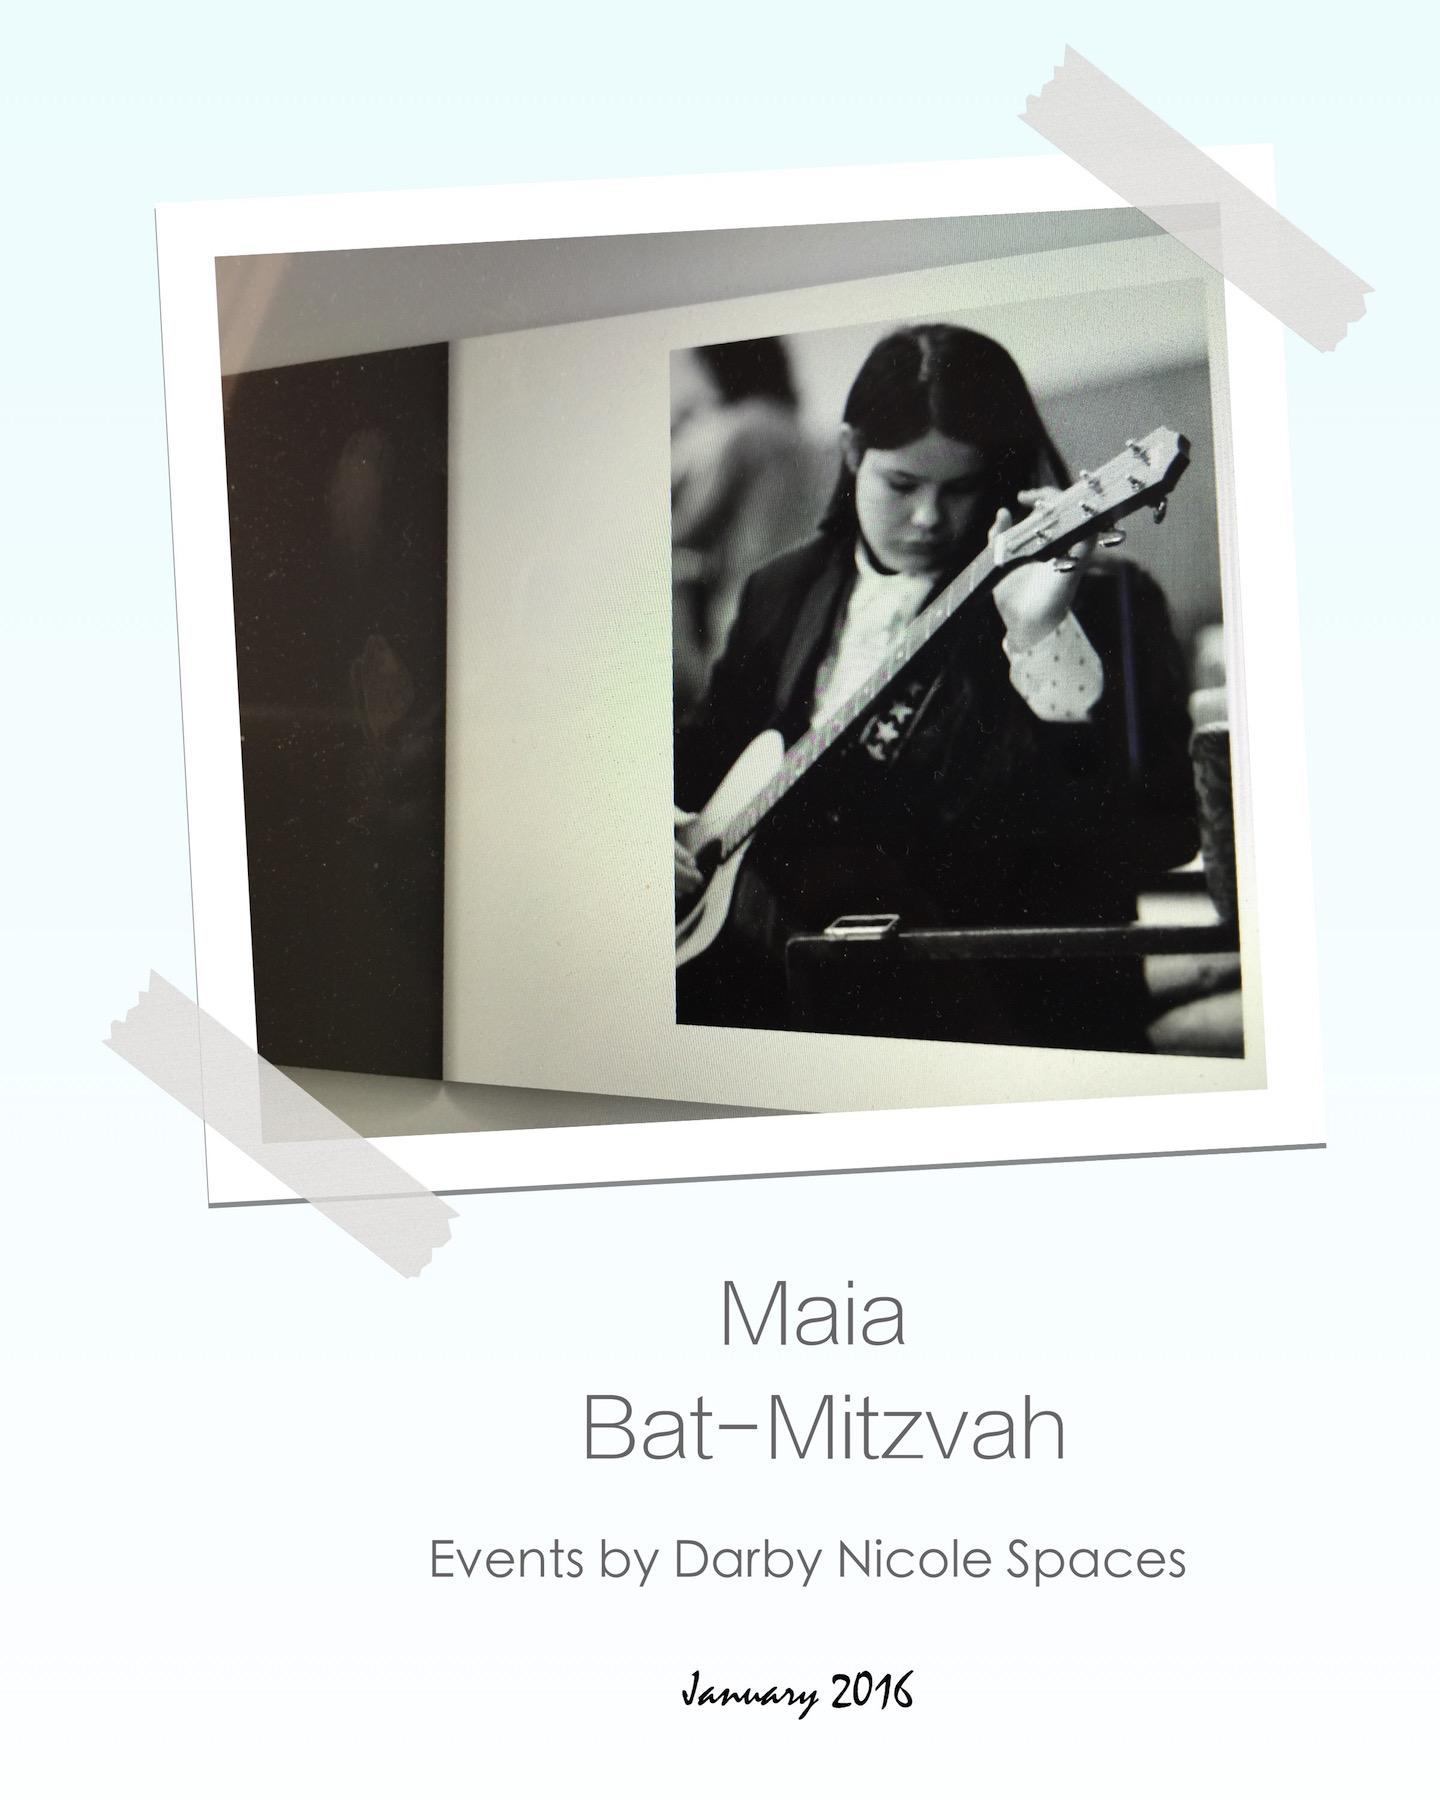 maia flyer.jpg